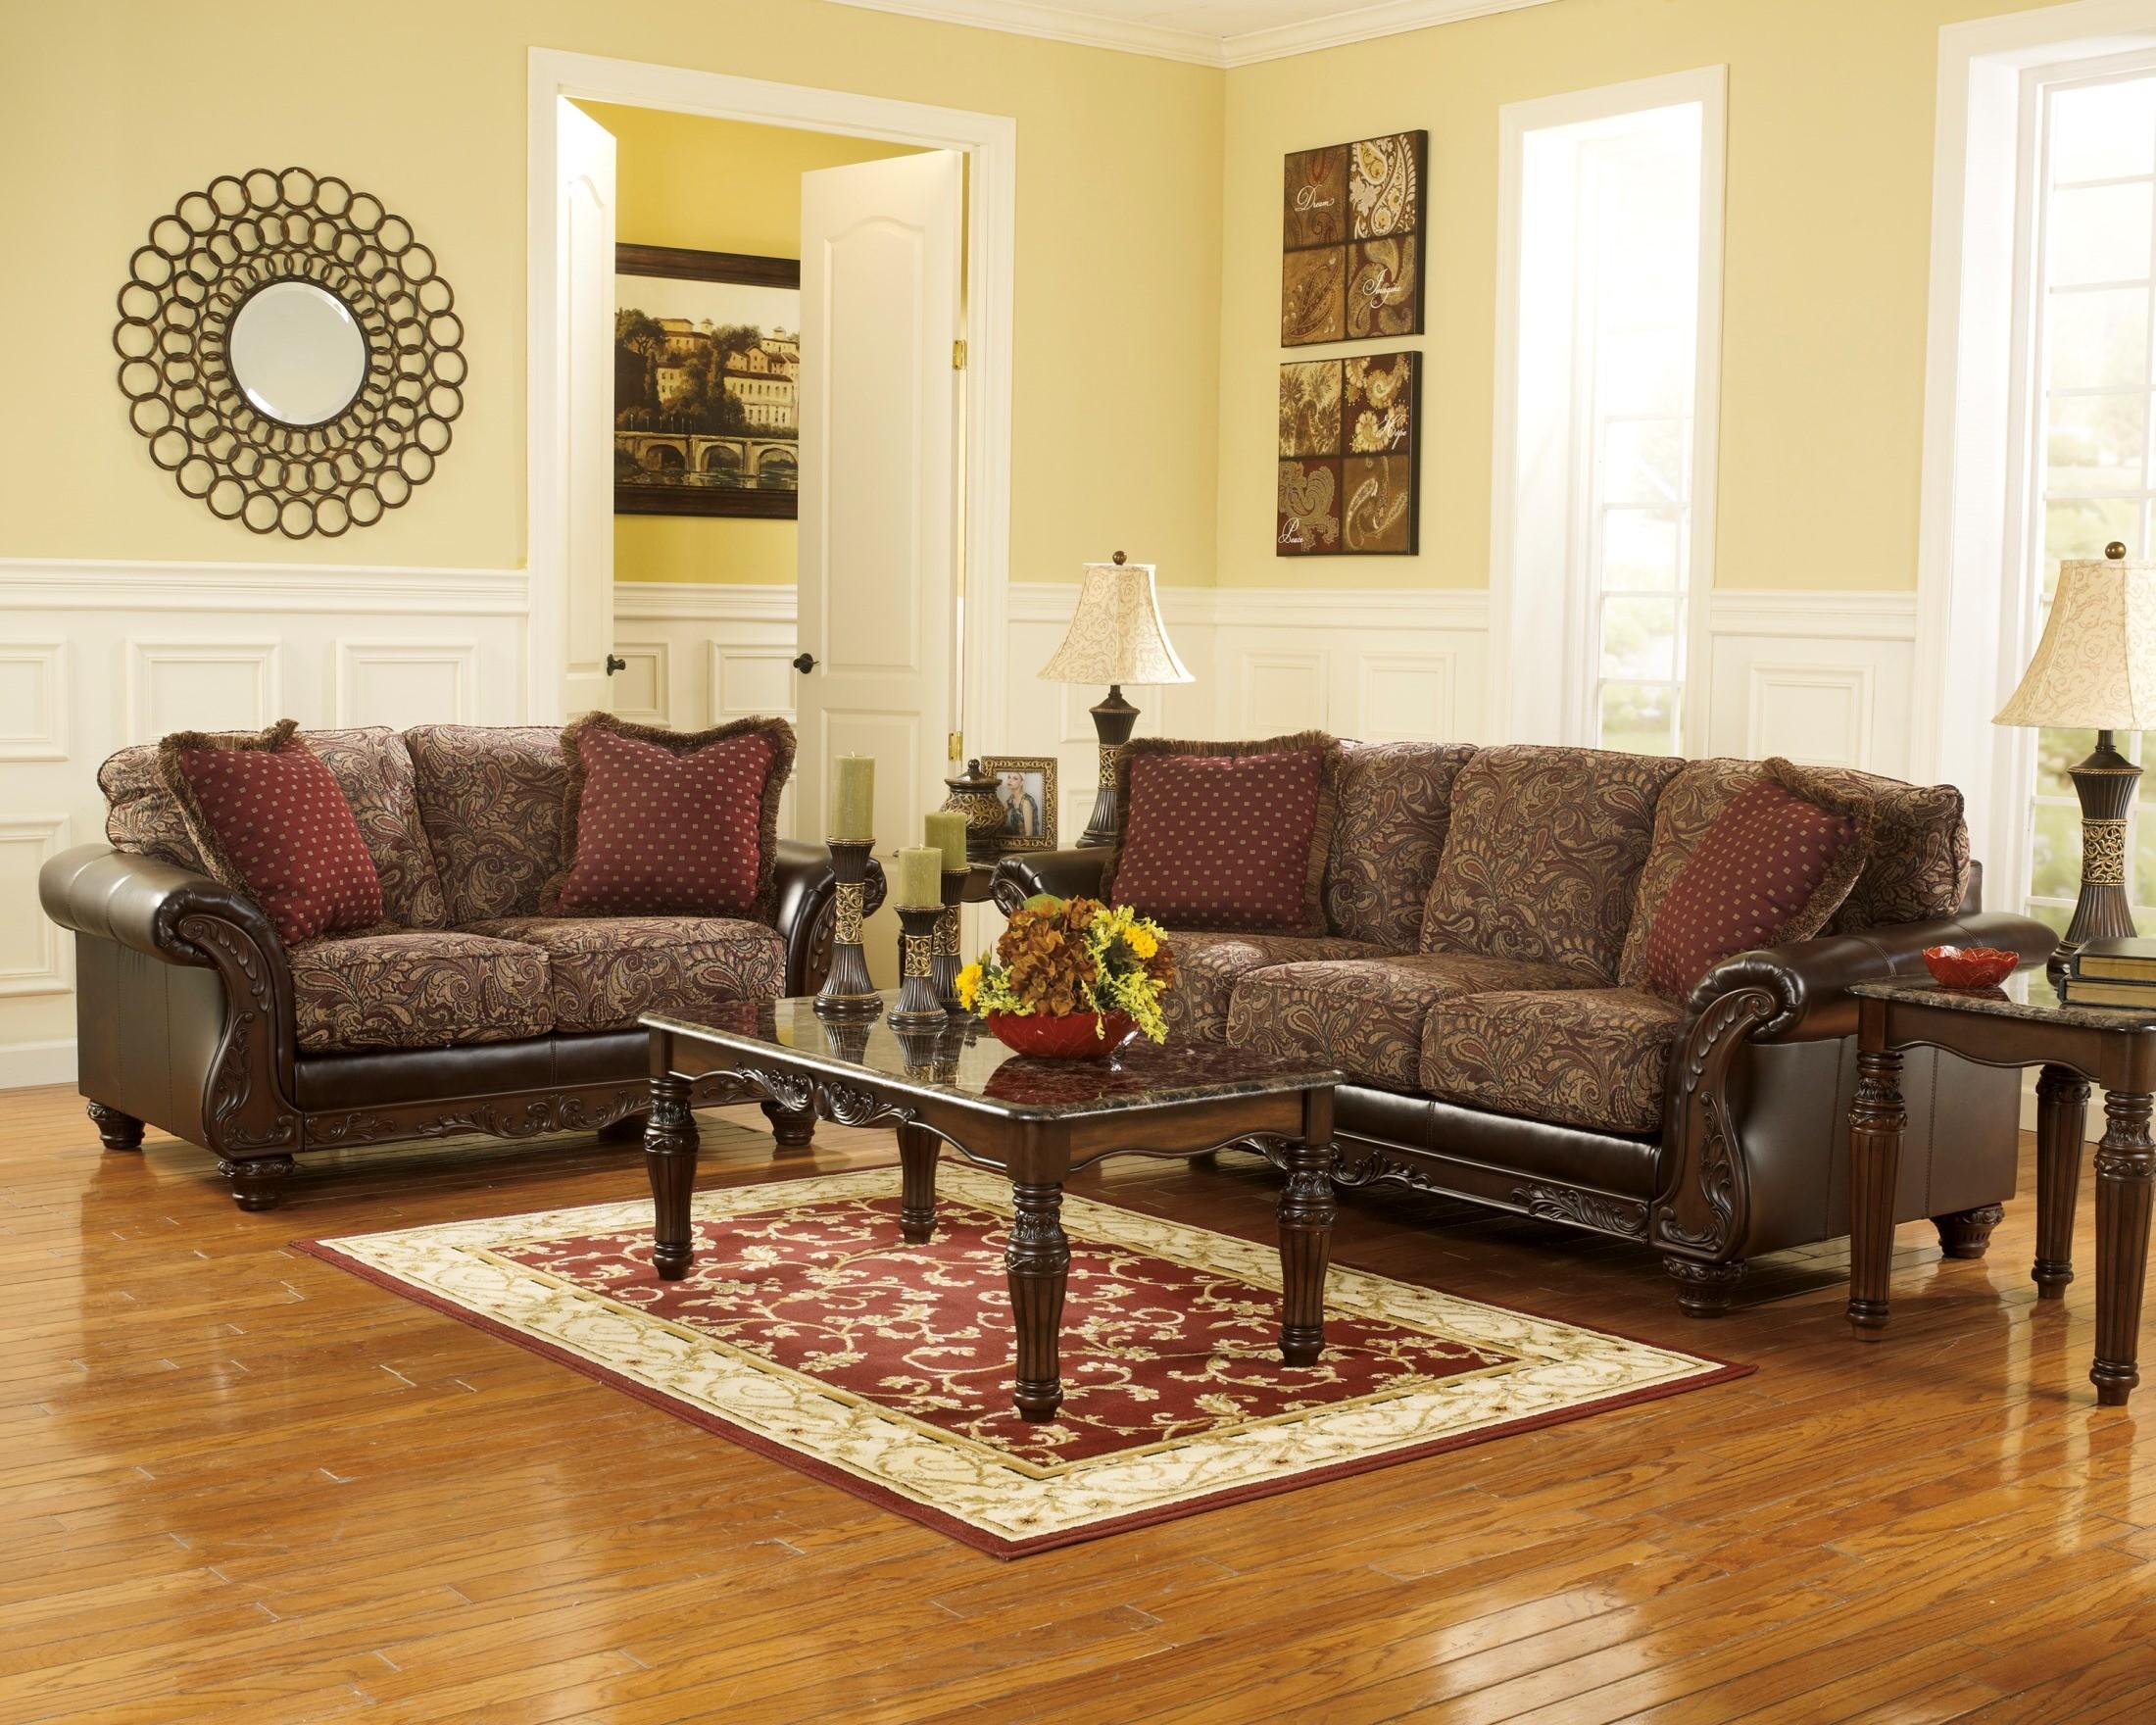 Macneill umber living room set 75802 ashley furniture - Living room furniture sets ashley ...